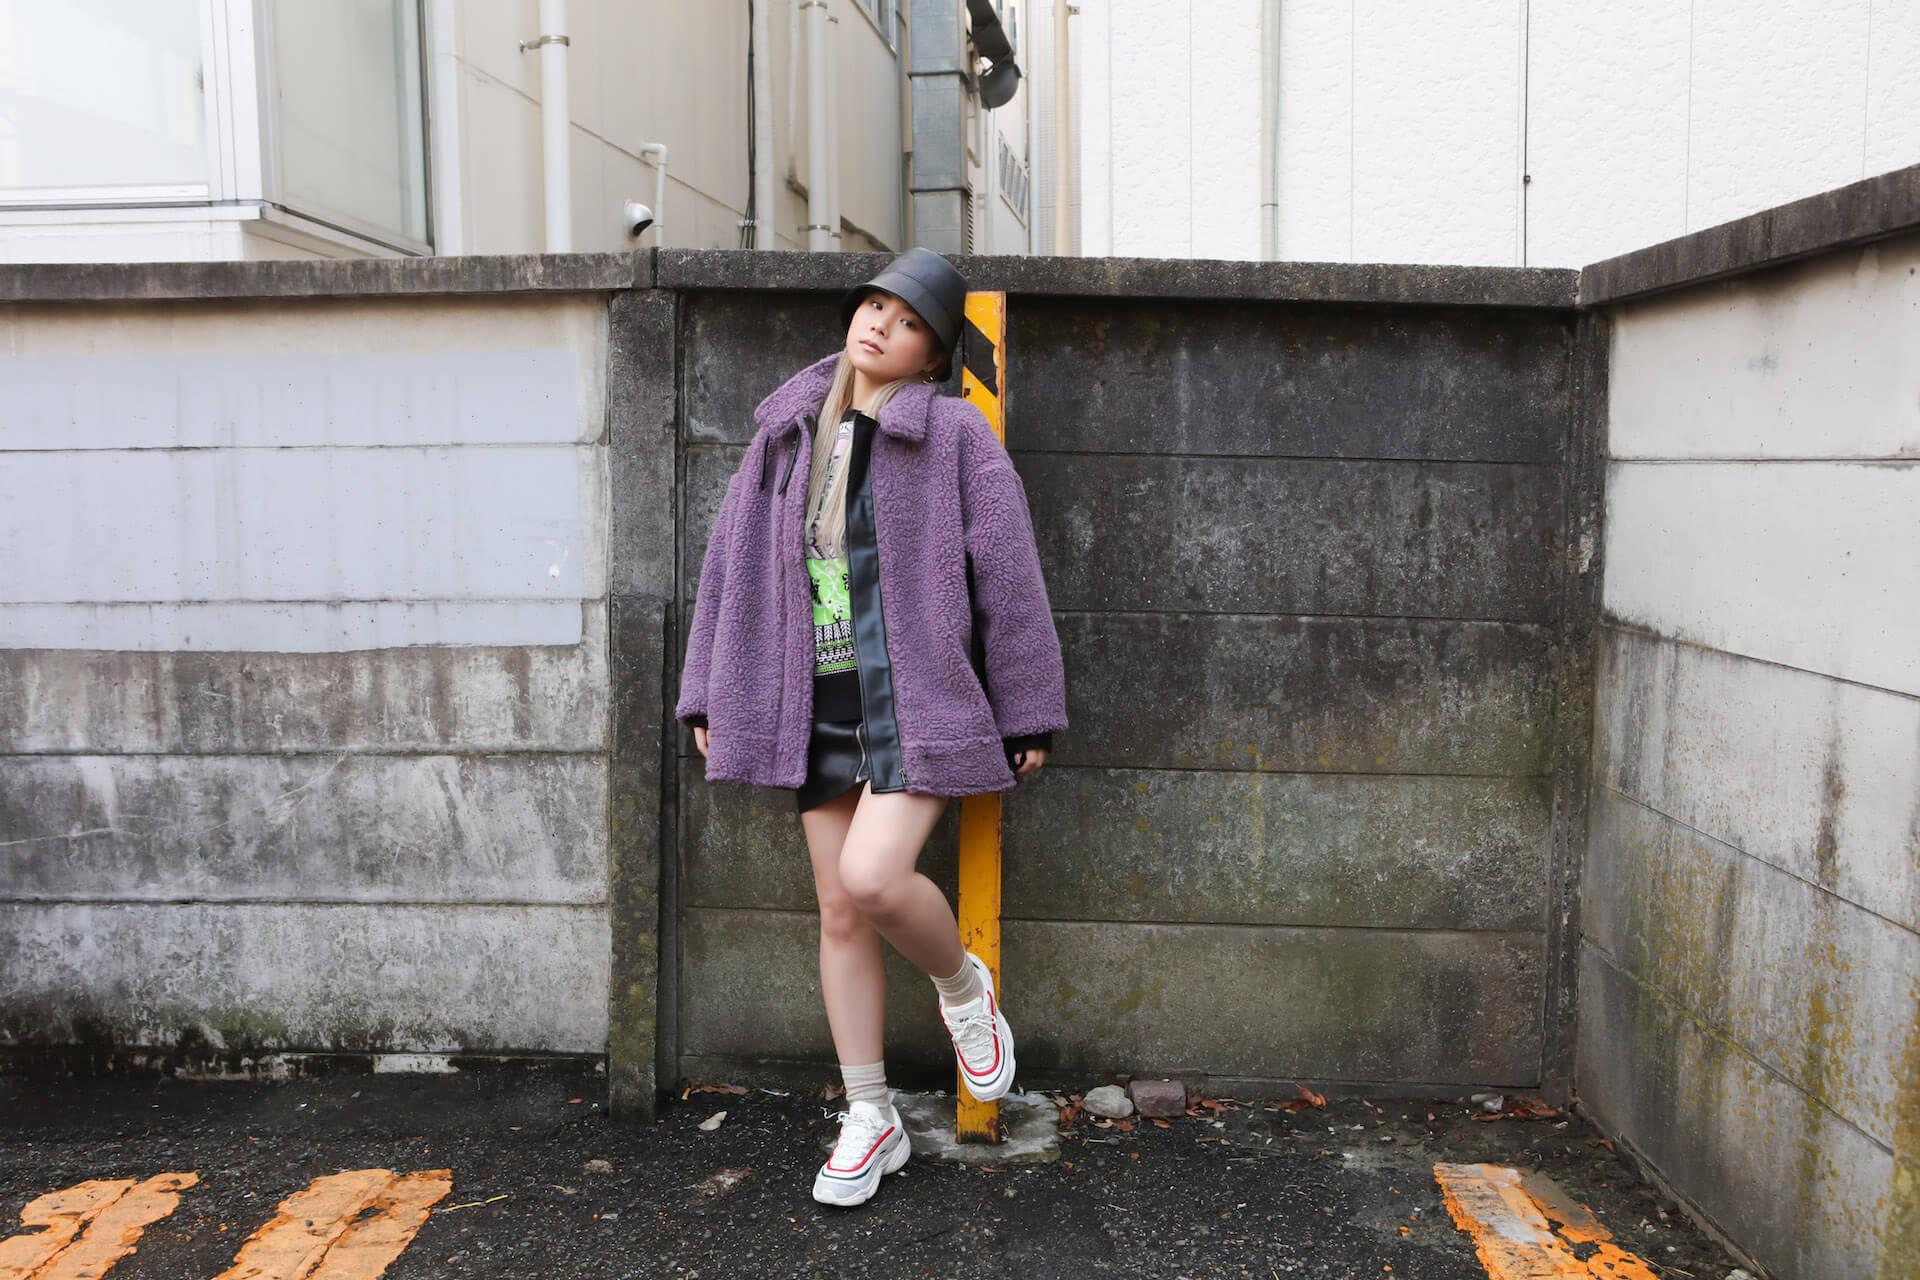 FILAの人気モデル『INTERATION』と『Z BUFFER2』にブラックベースが登場!『RAY RUN』ニューカラーもatmos系列限定で発売 fashion201216_atmos_fila_2